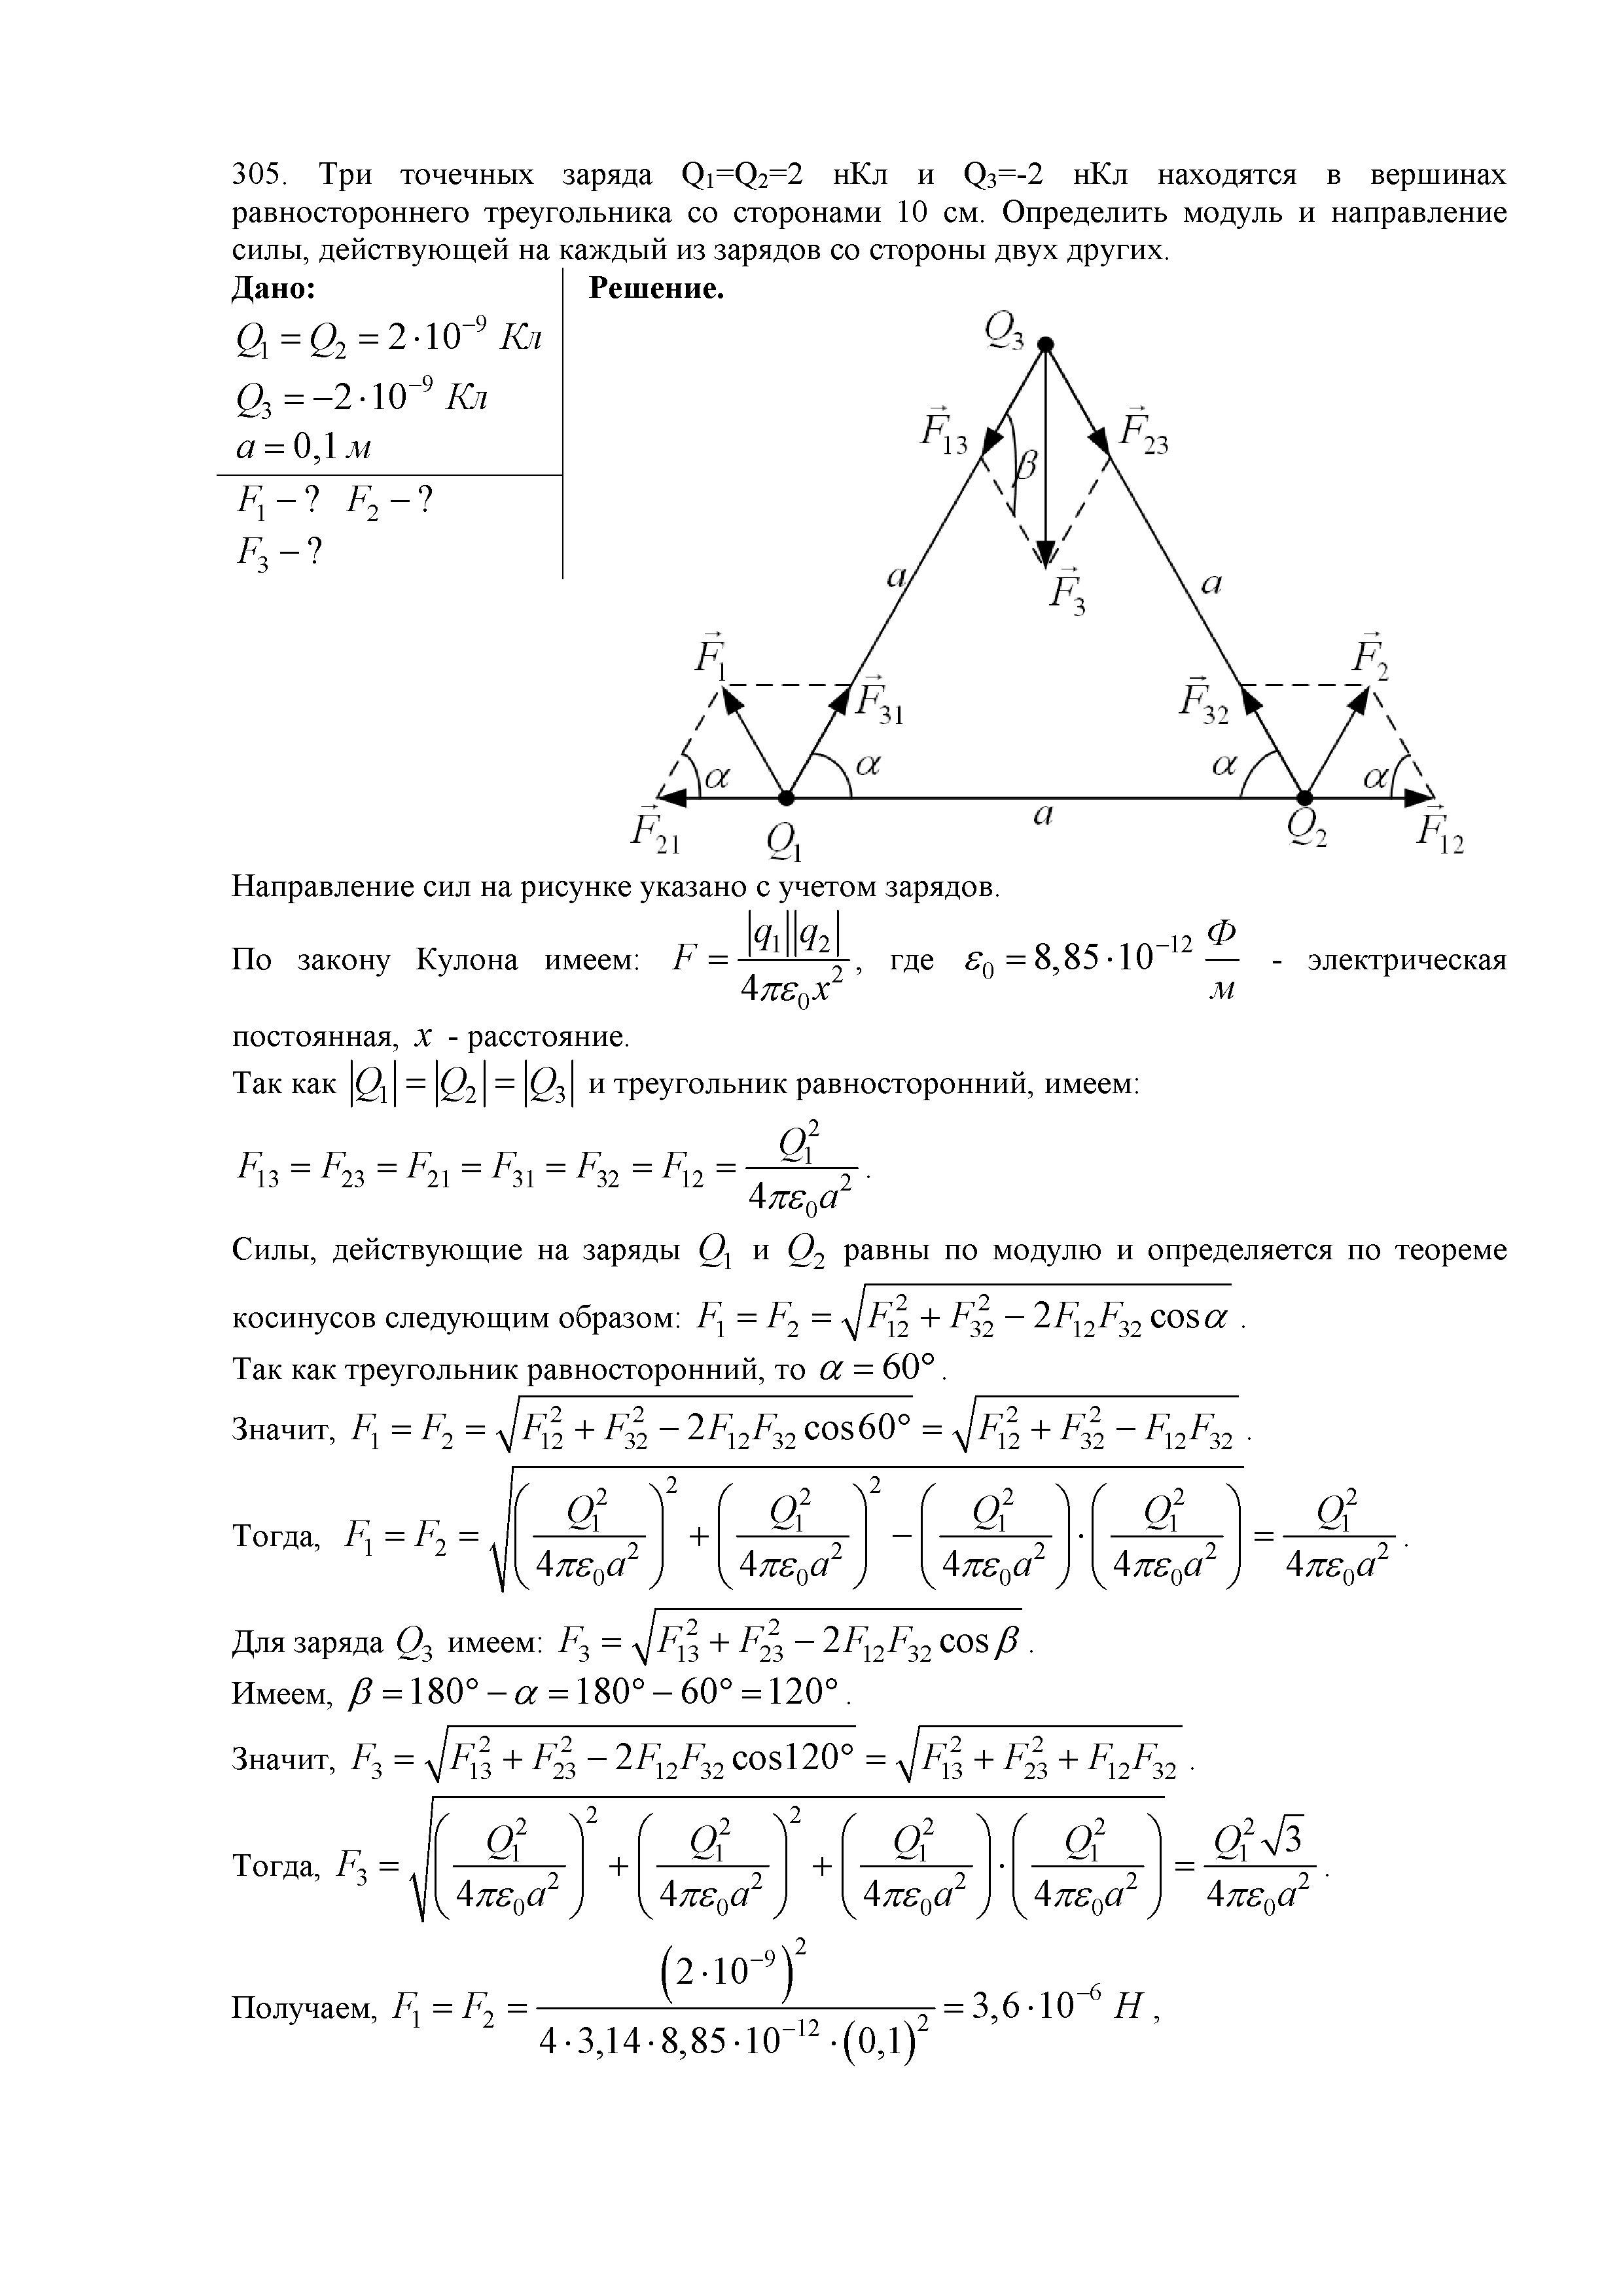 Задачник по физике с решениями задач.